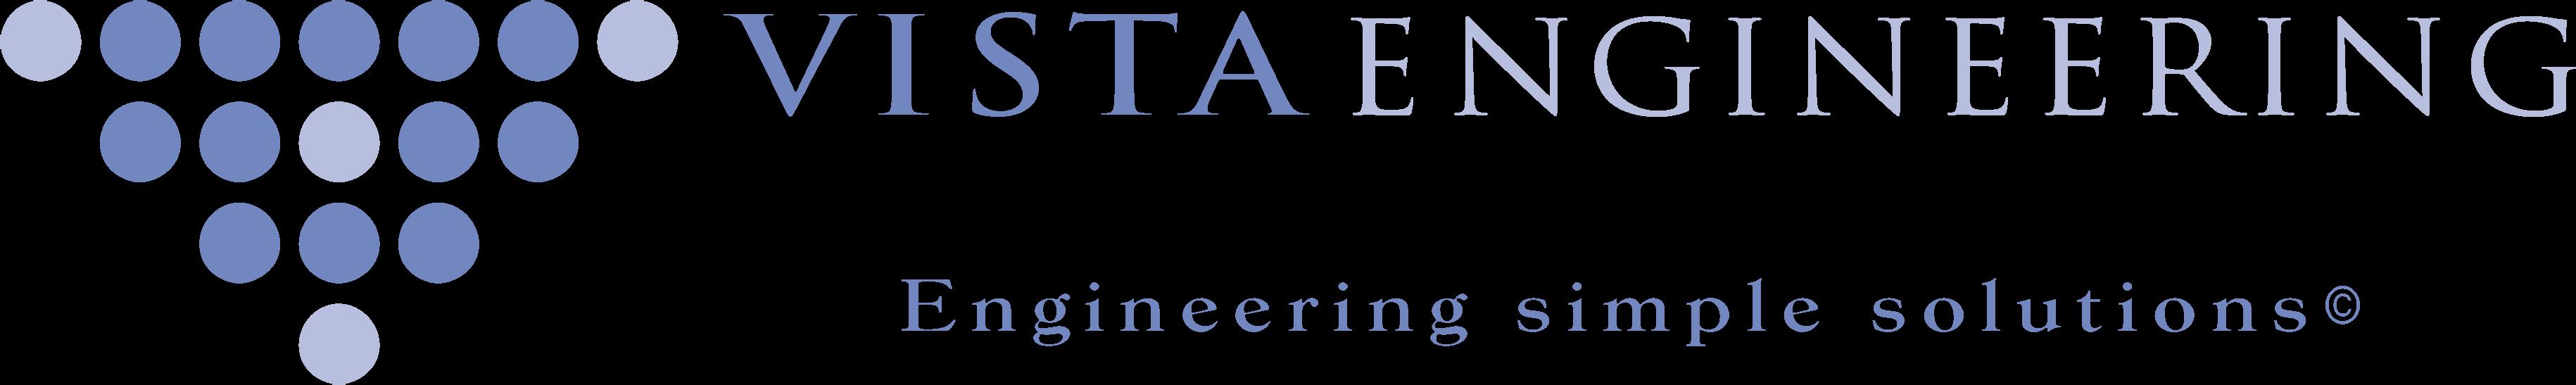 Vista Engineering & Consulting